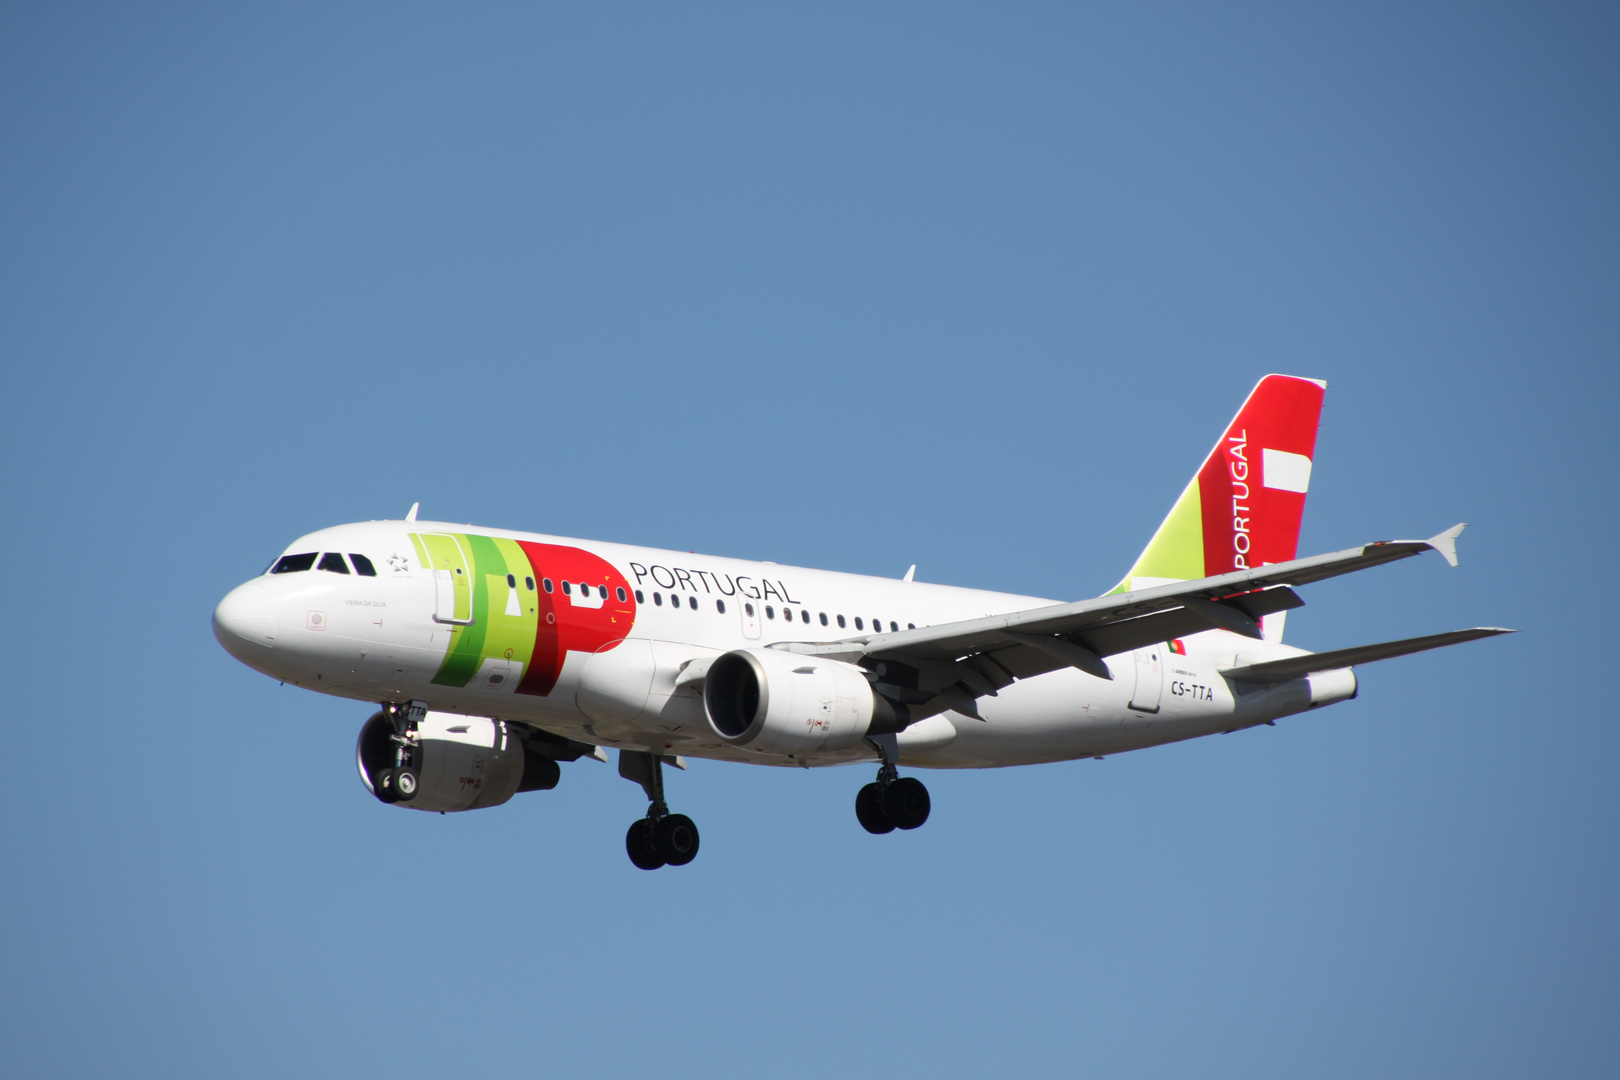 TAP Portugal im Anflug auf Rhein-Main